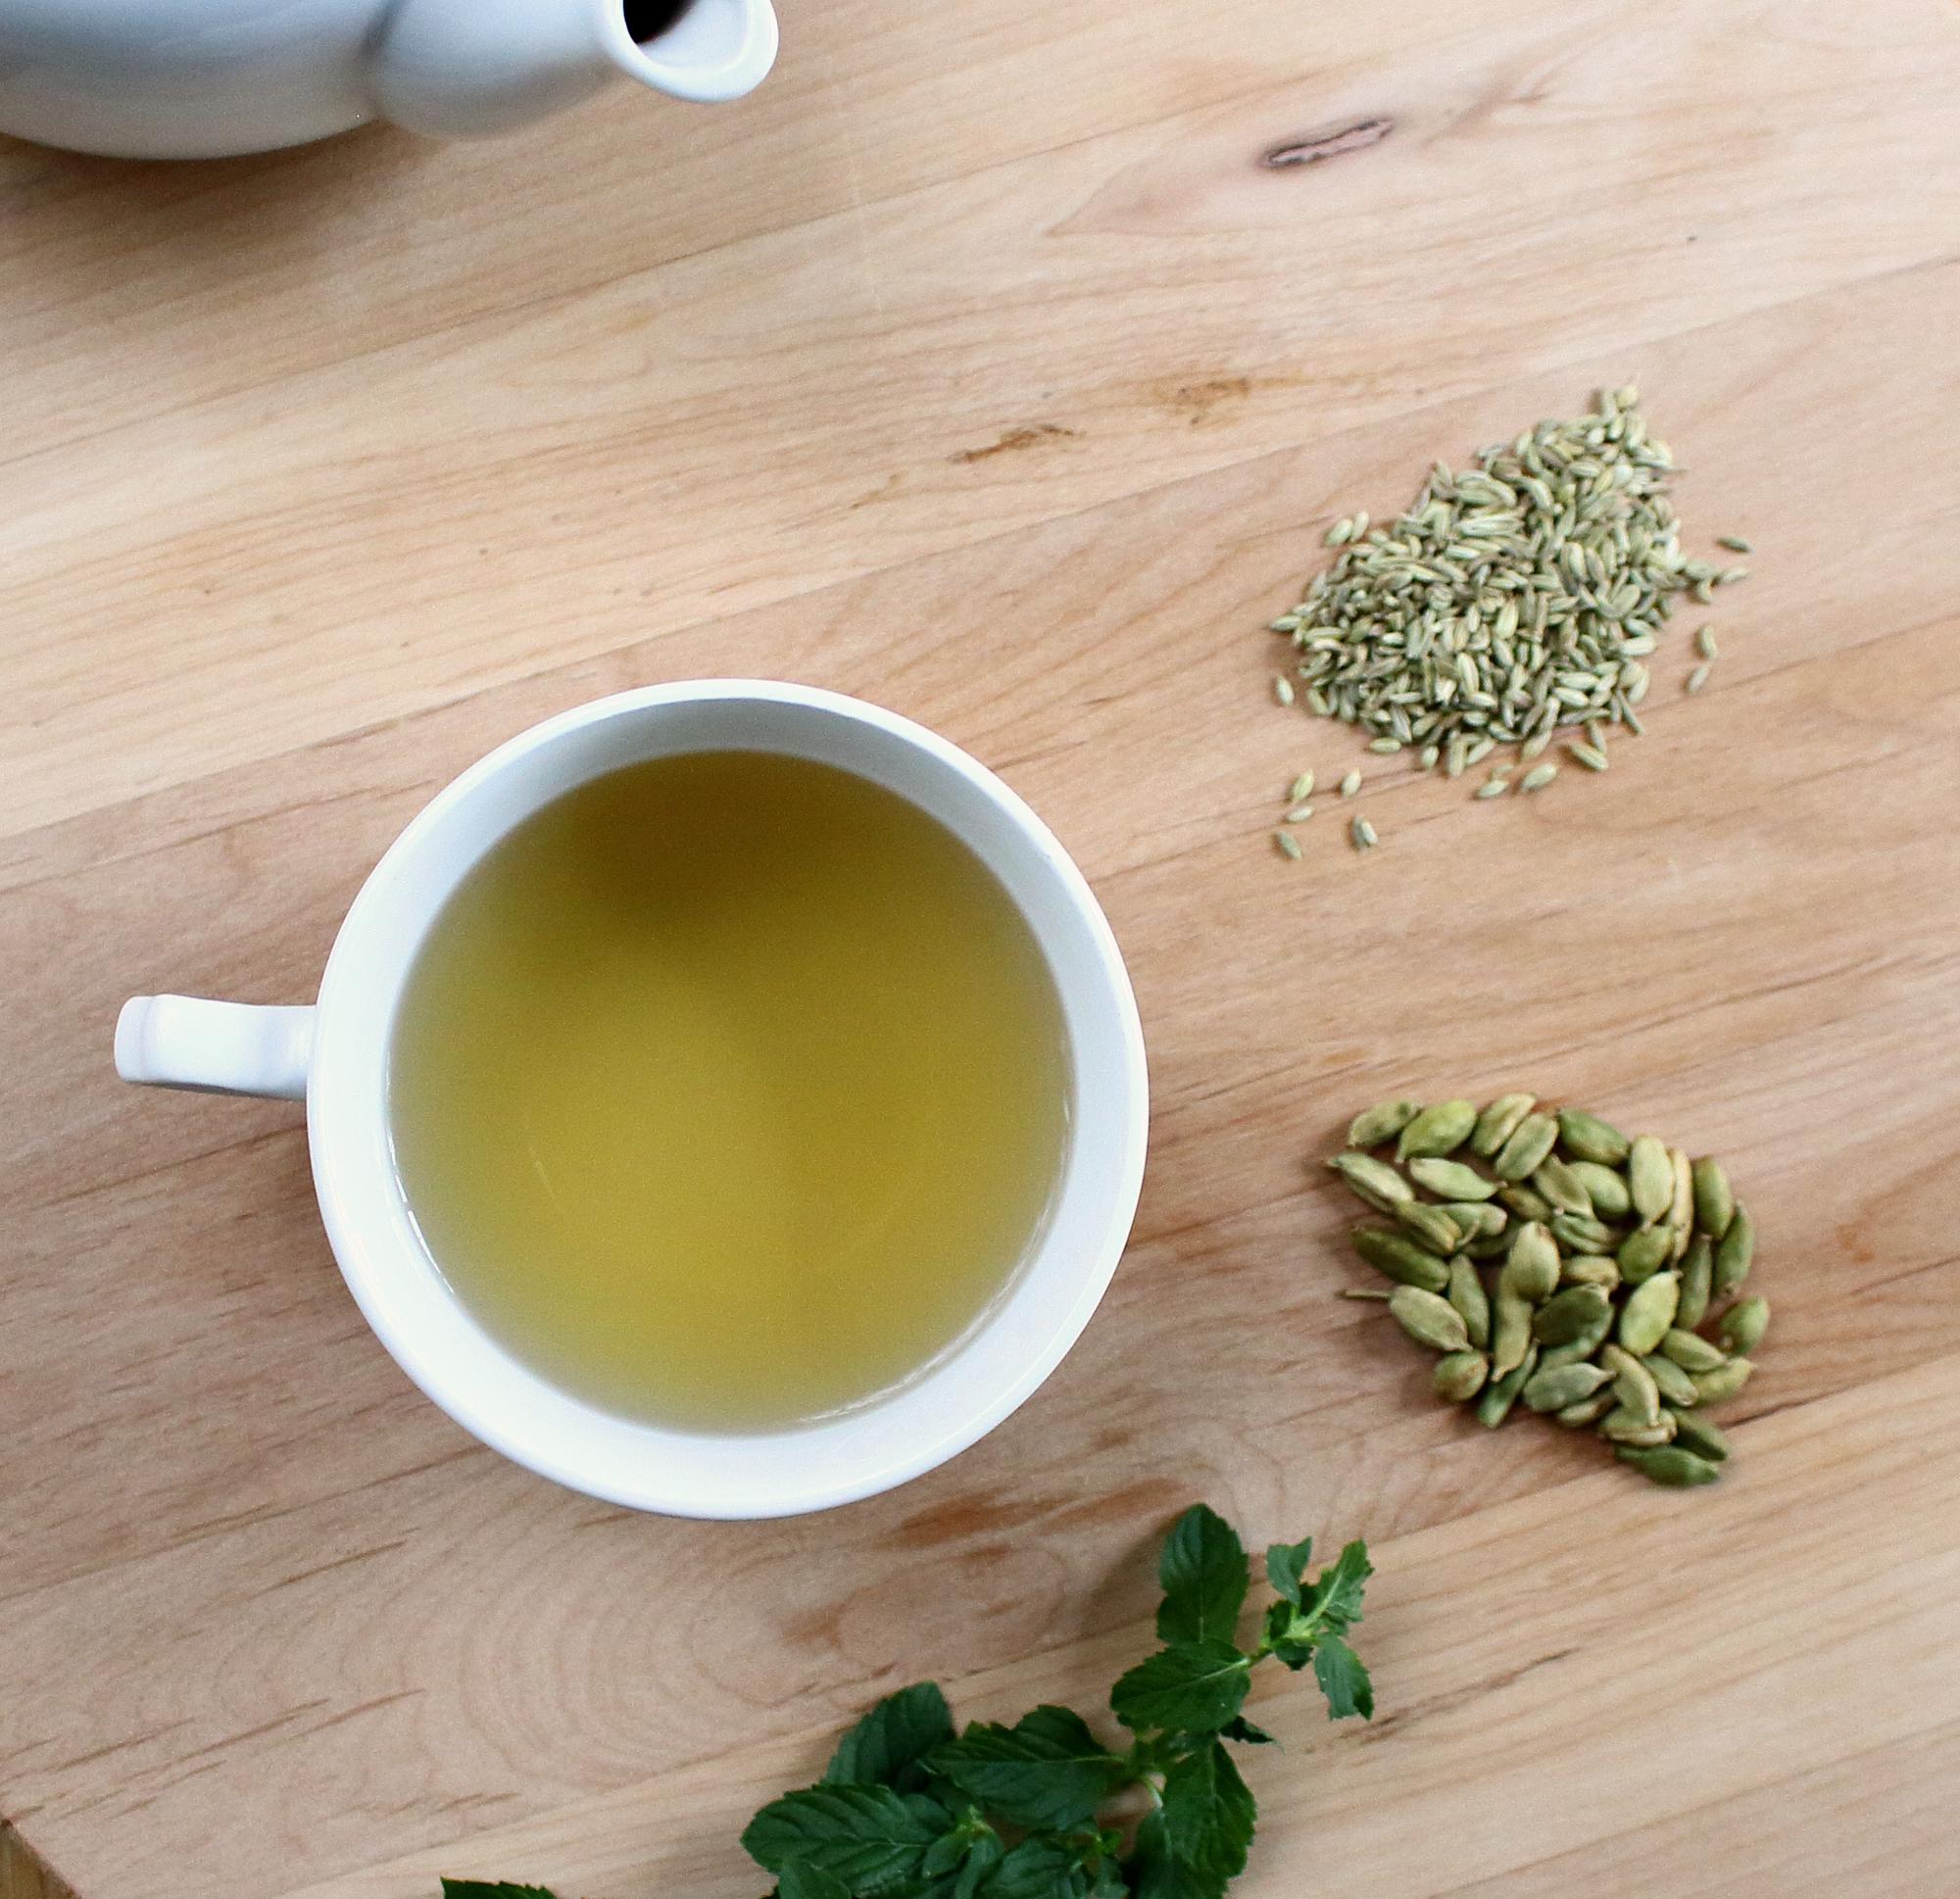 Fennel Mint and Cardamom Tea